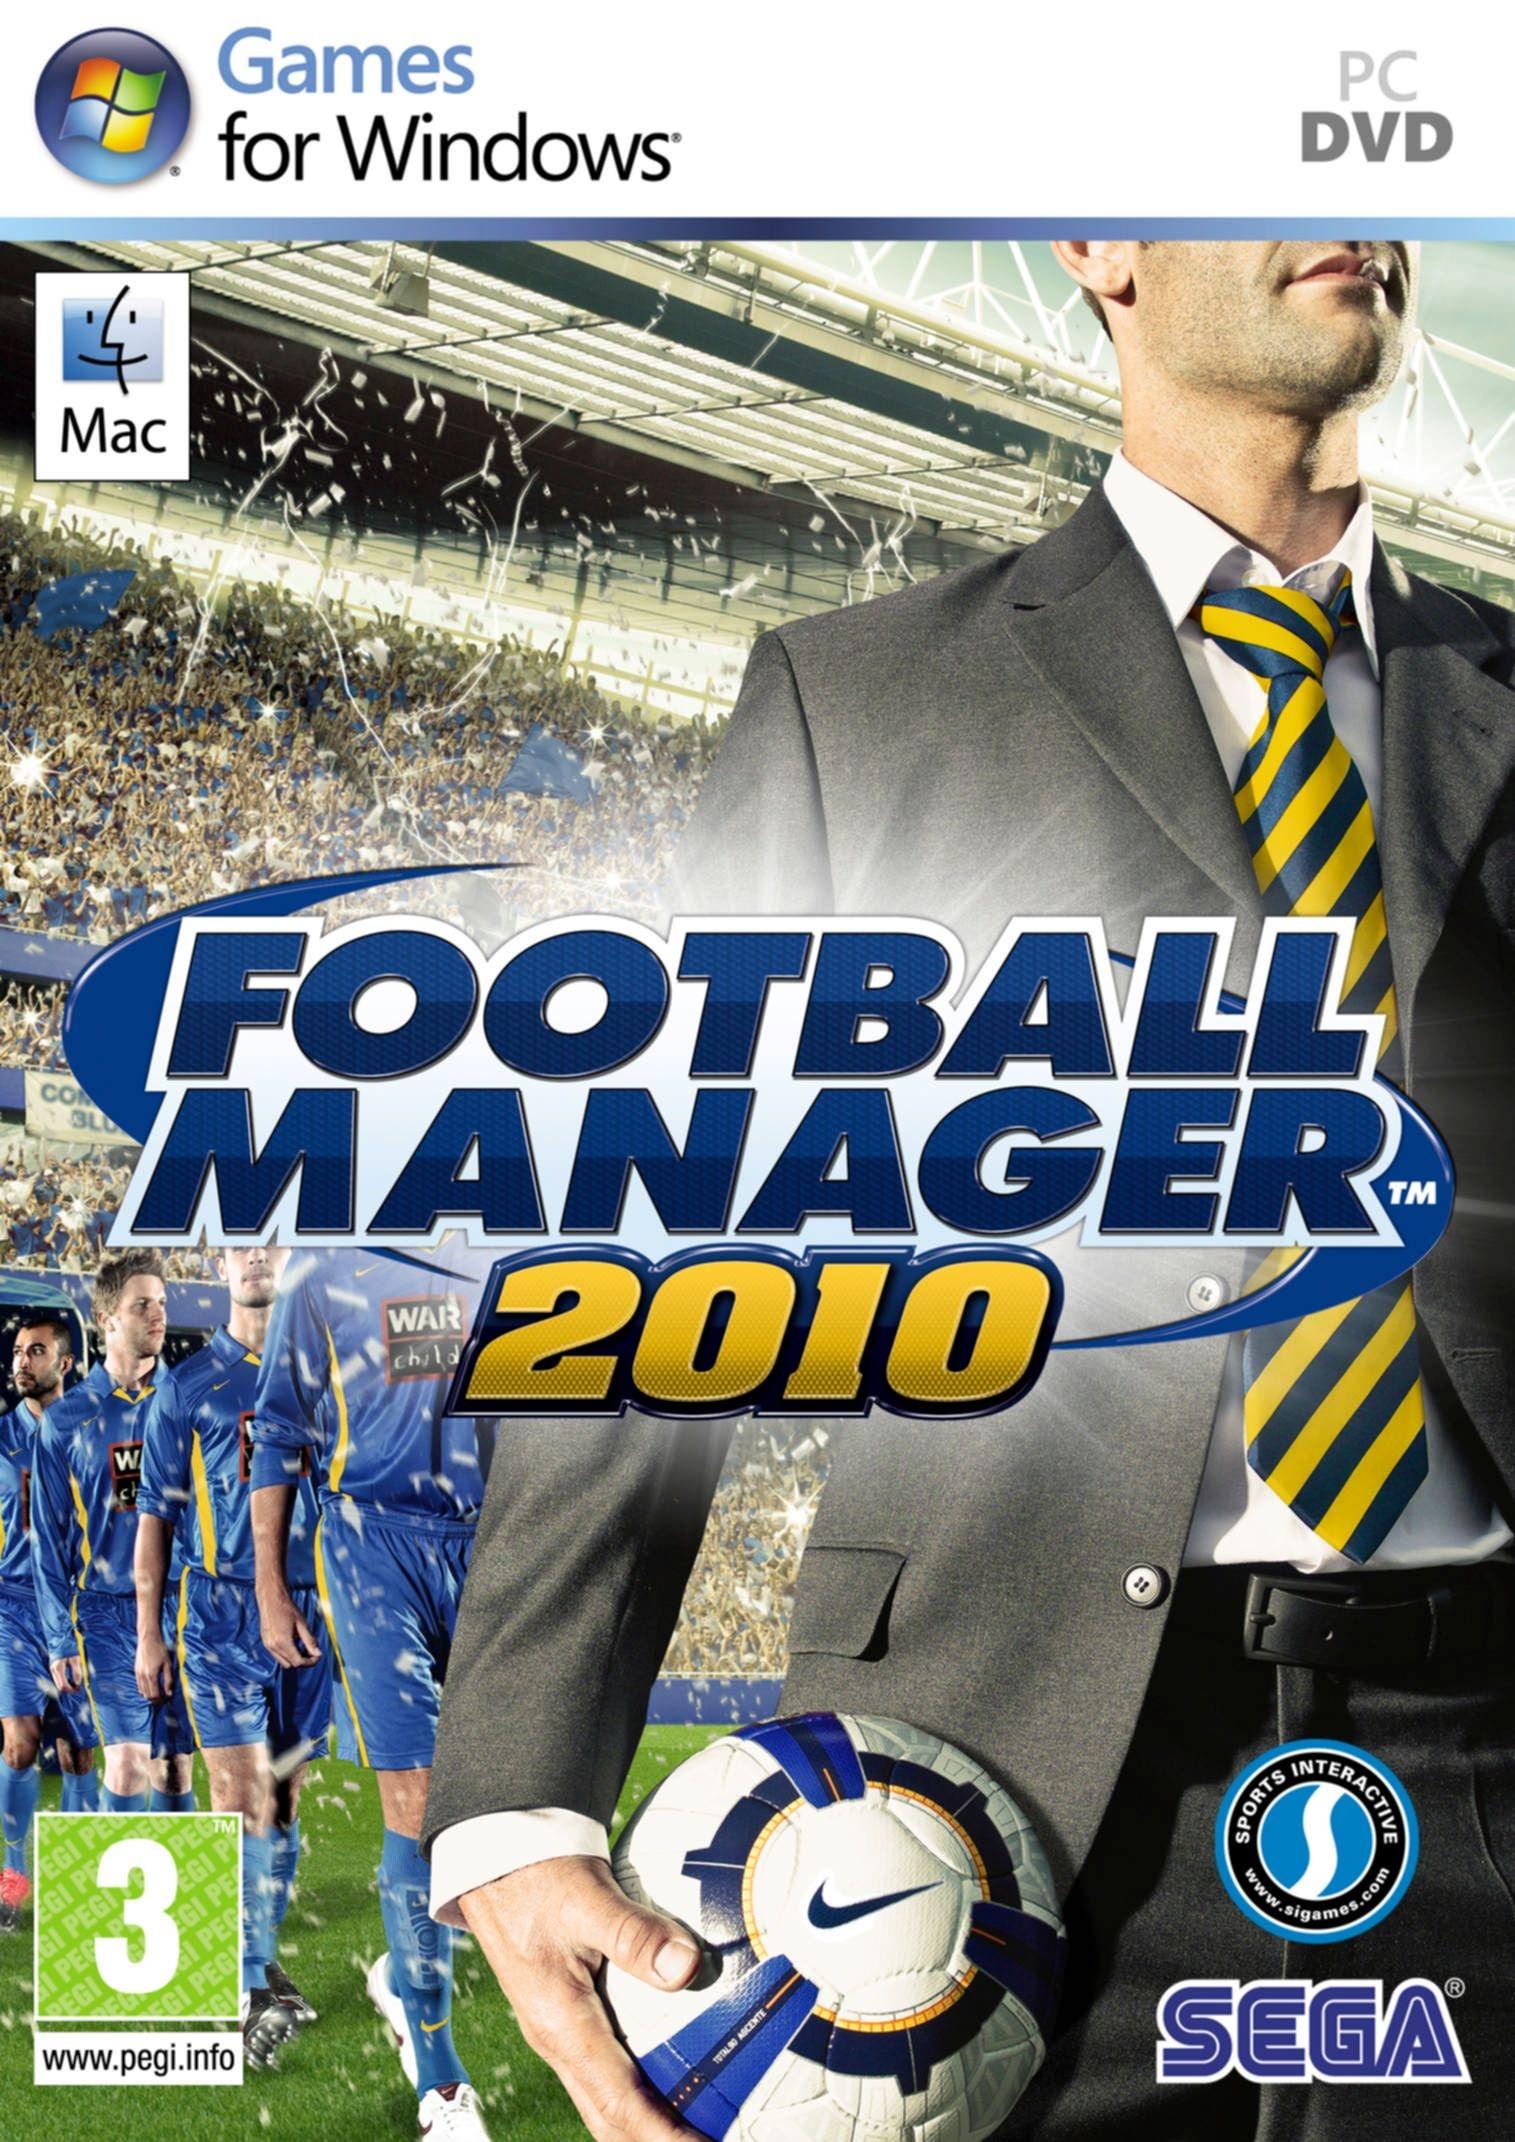 Bышел второй большой патч для Football Manager 2010.